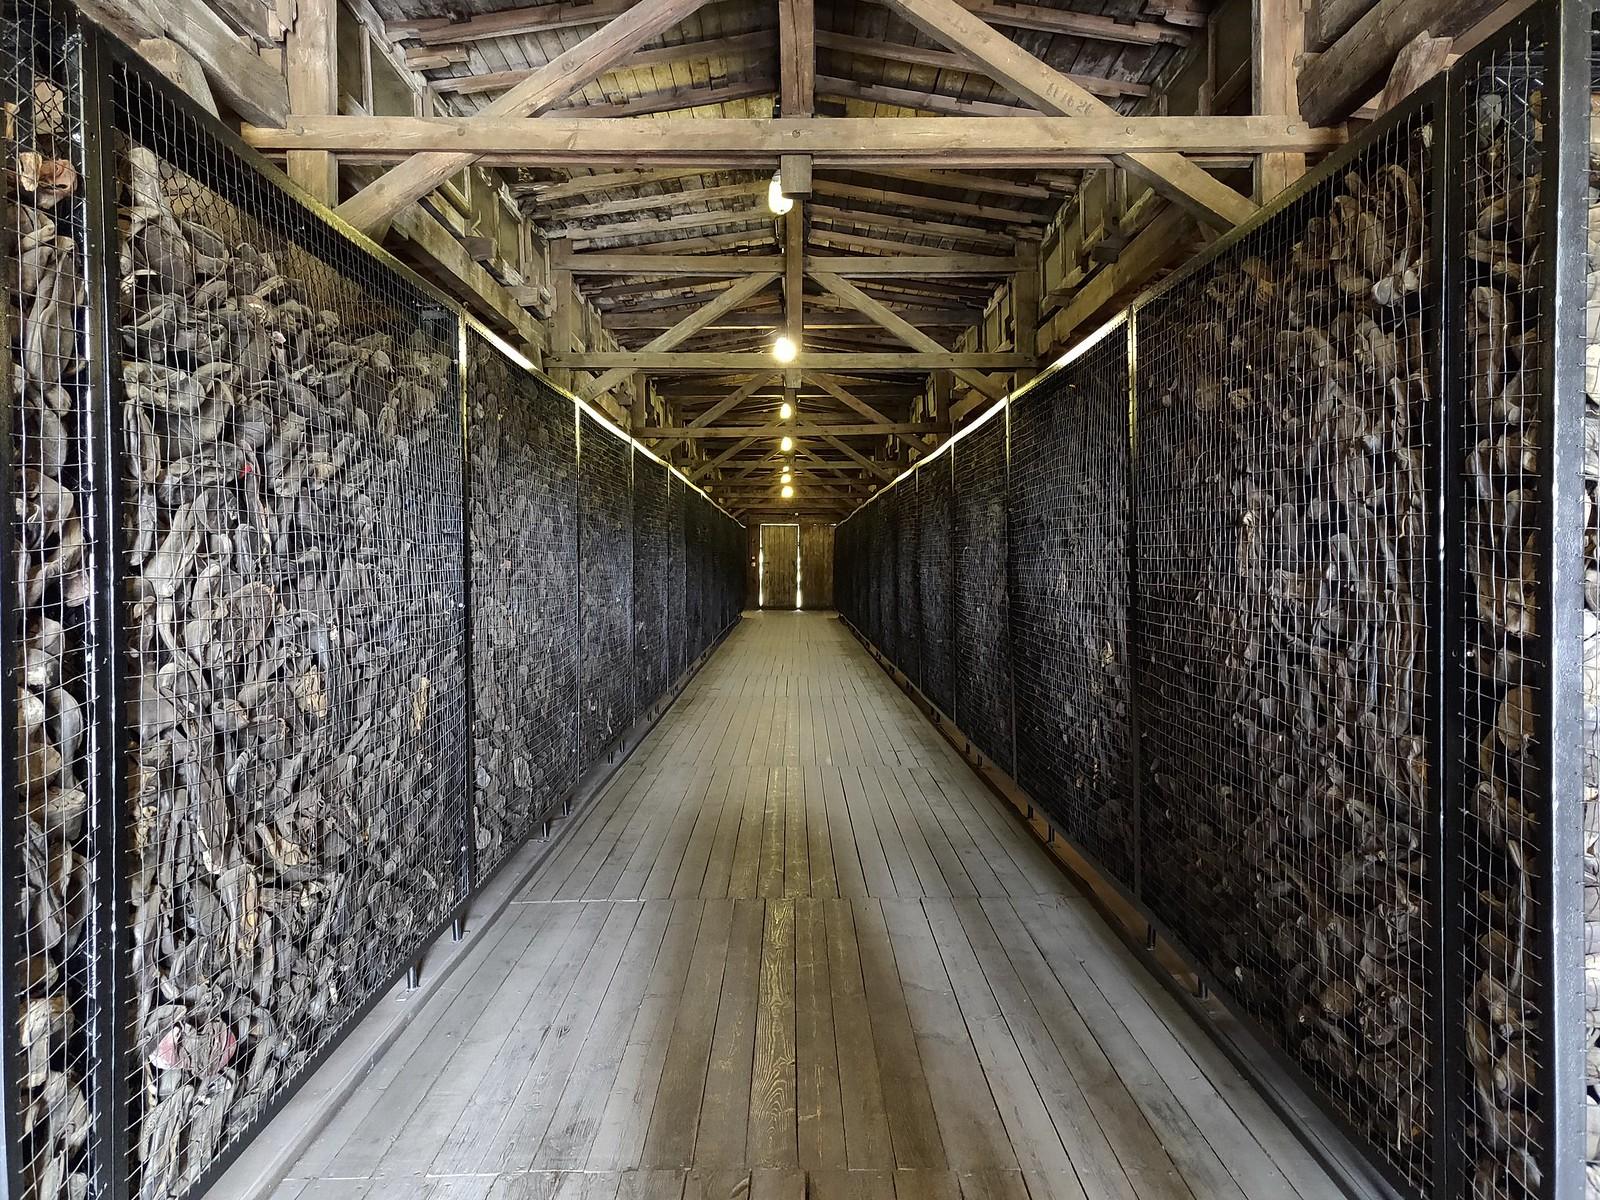 Majdanekin keskitysleiri Lublin